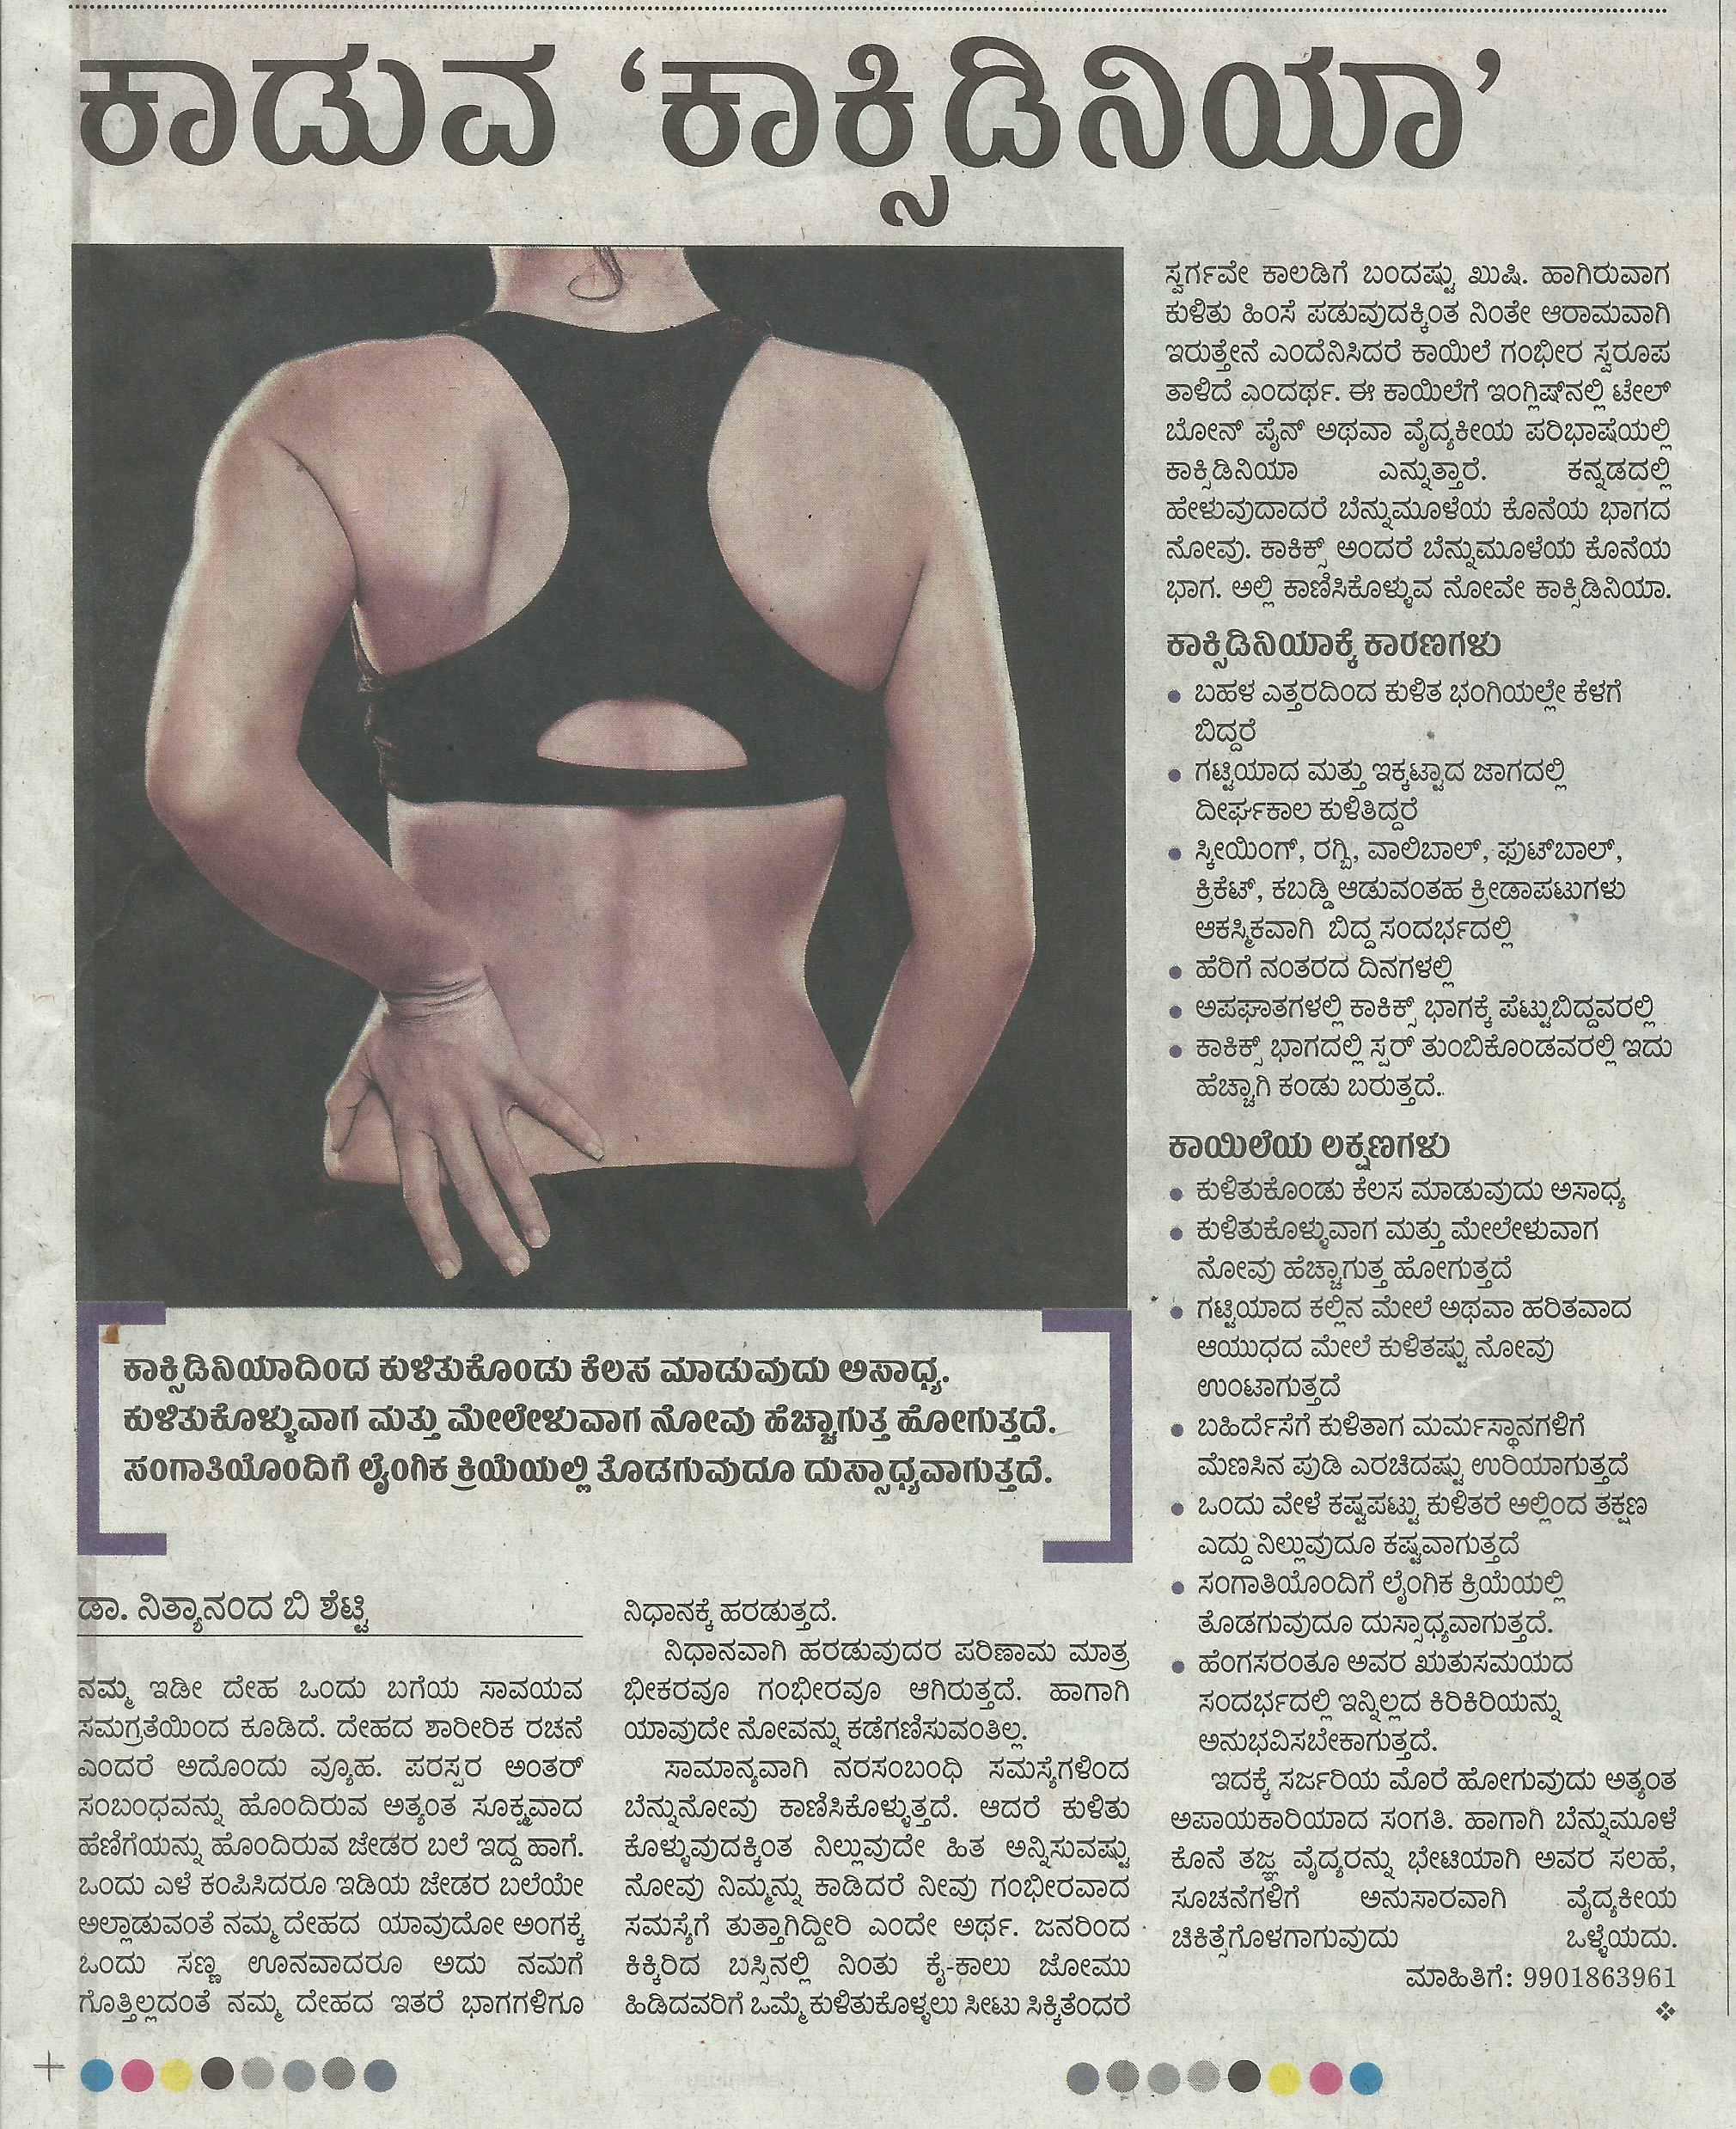 Tailbone Article in Prajavani News Paper